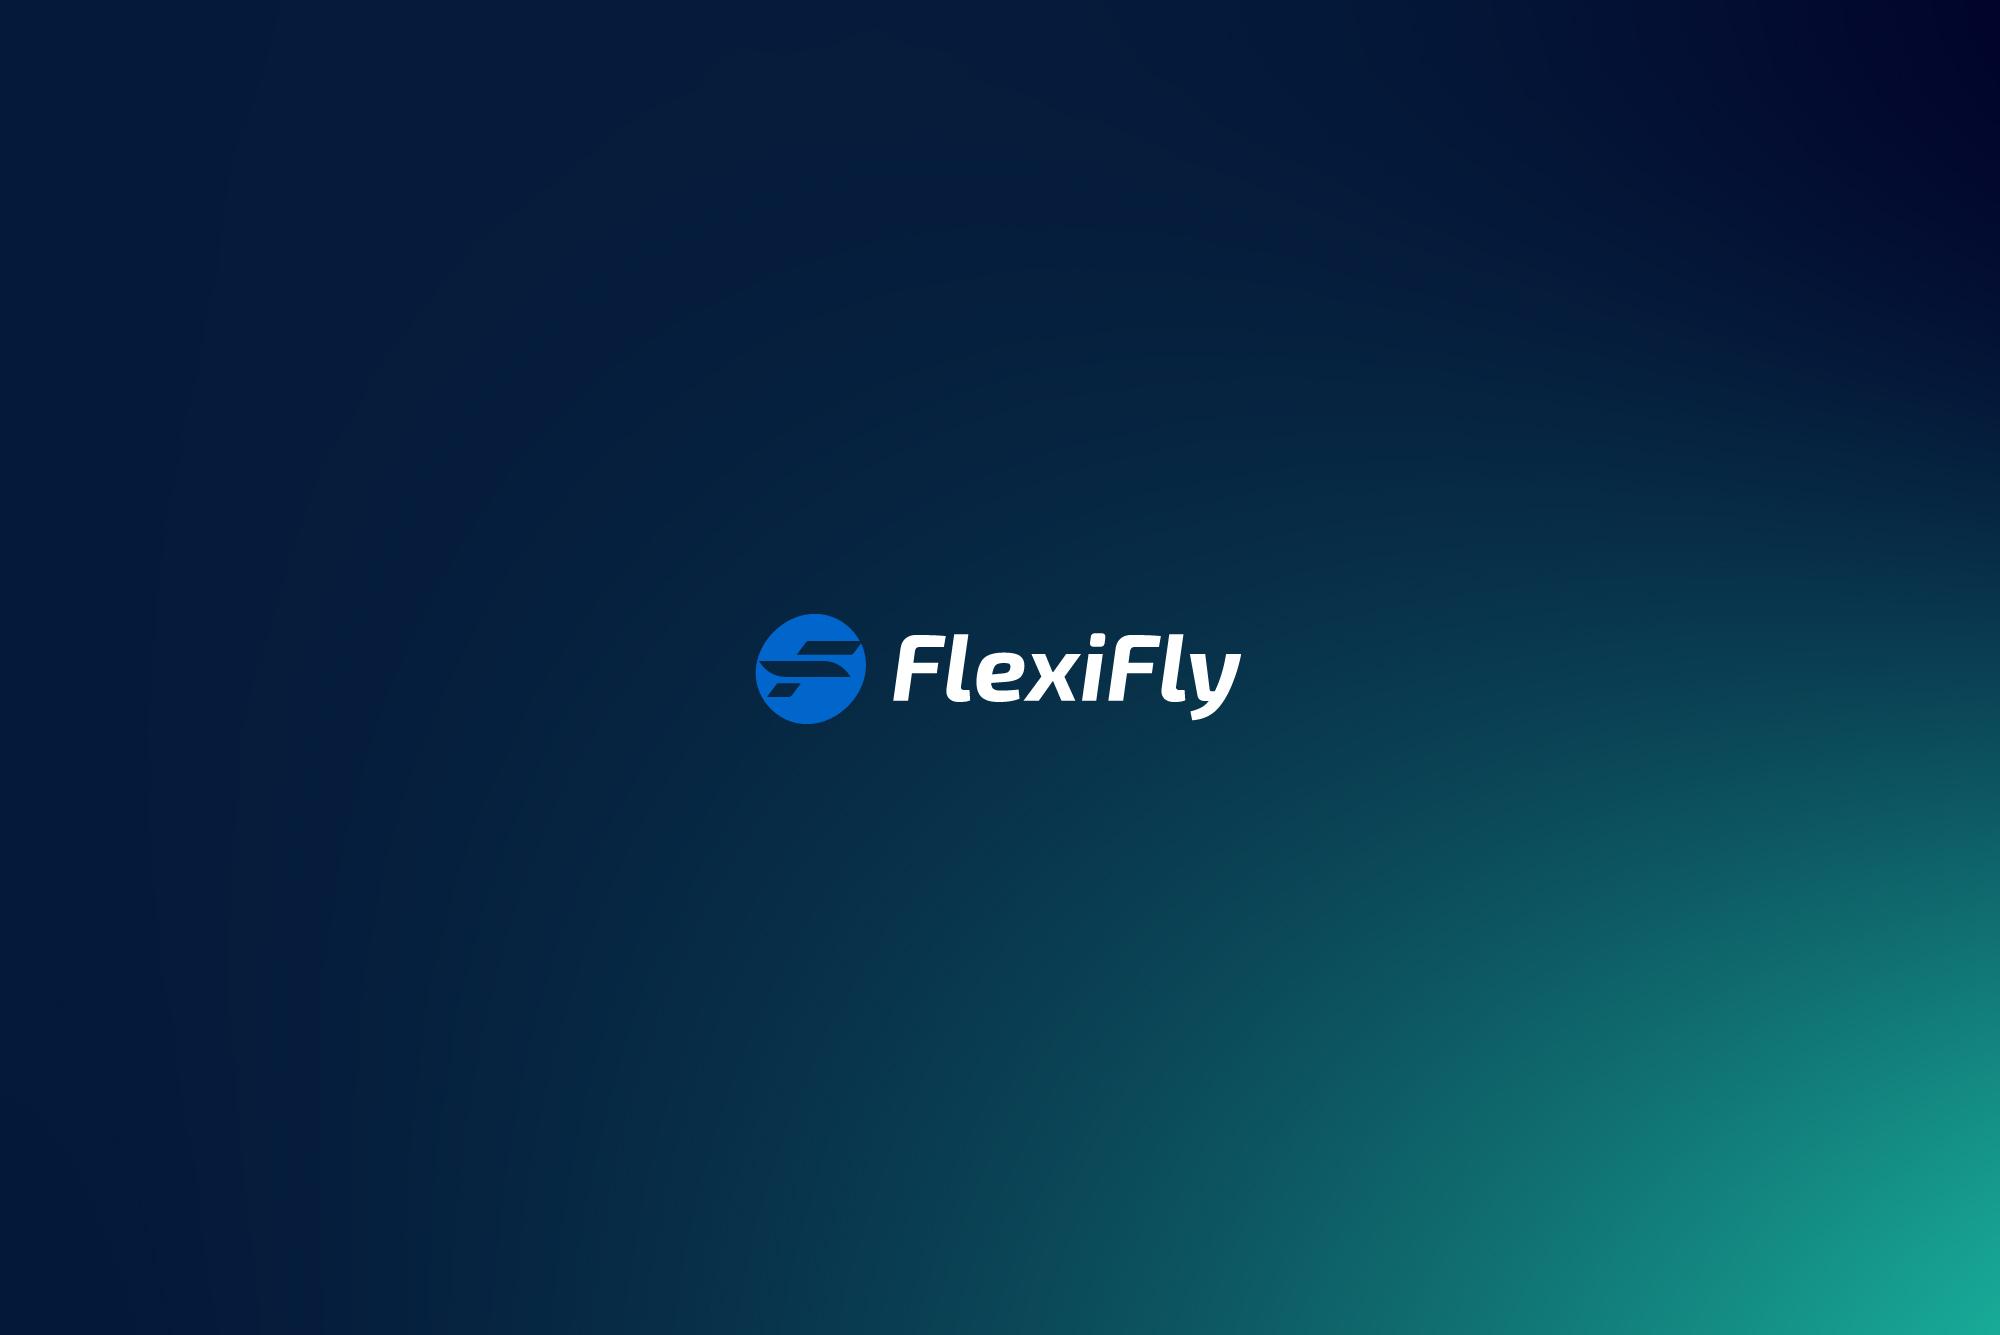 FlexiFly logo design and website